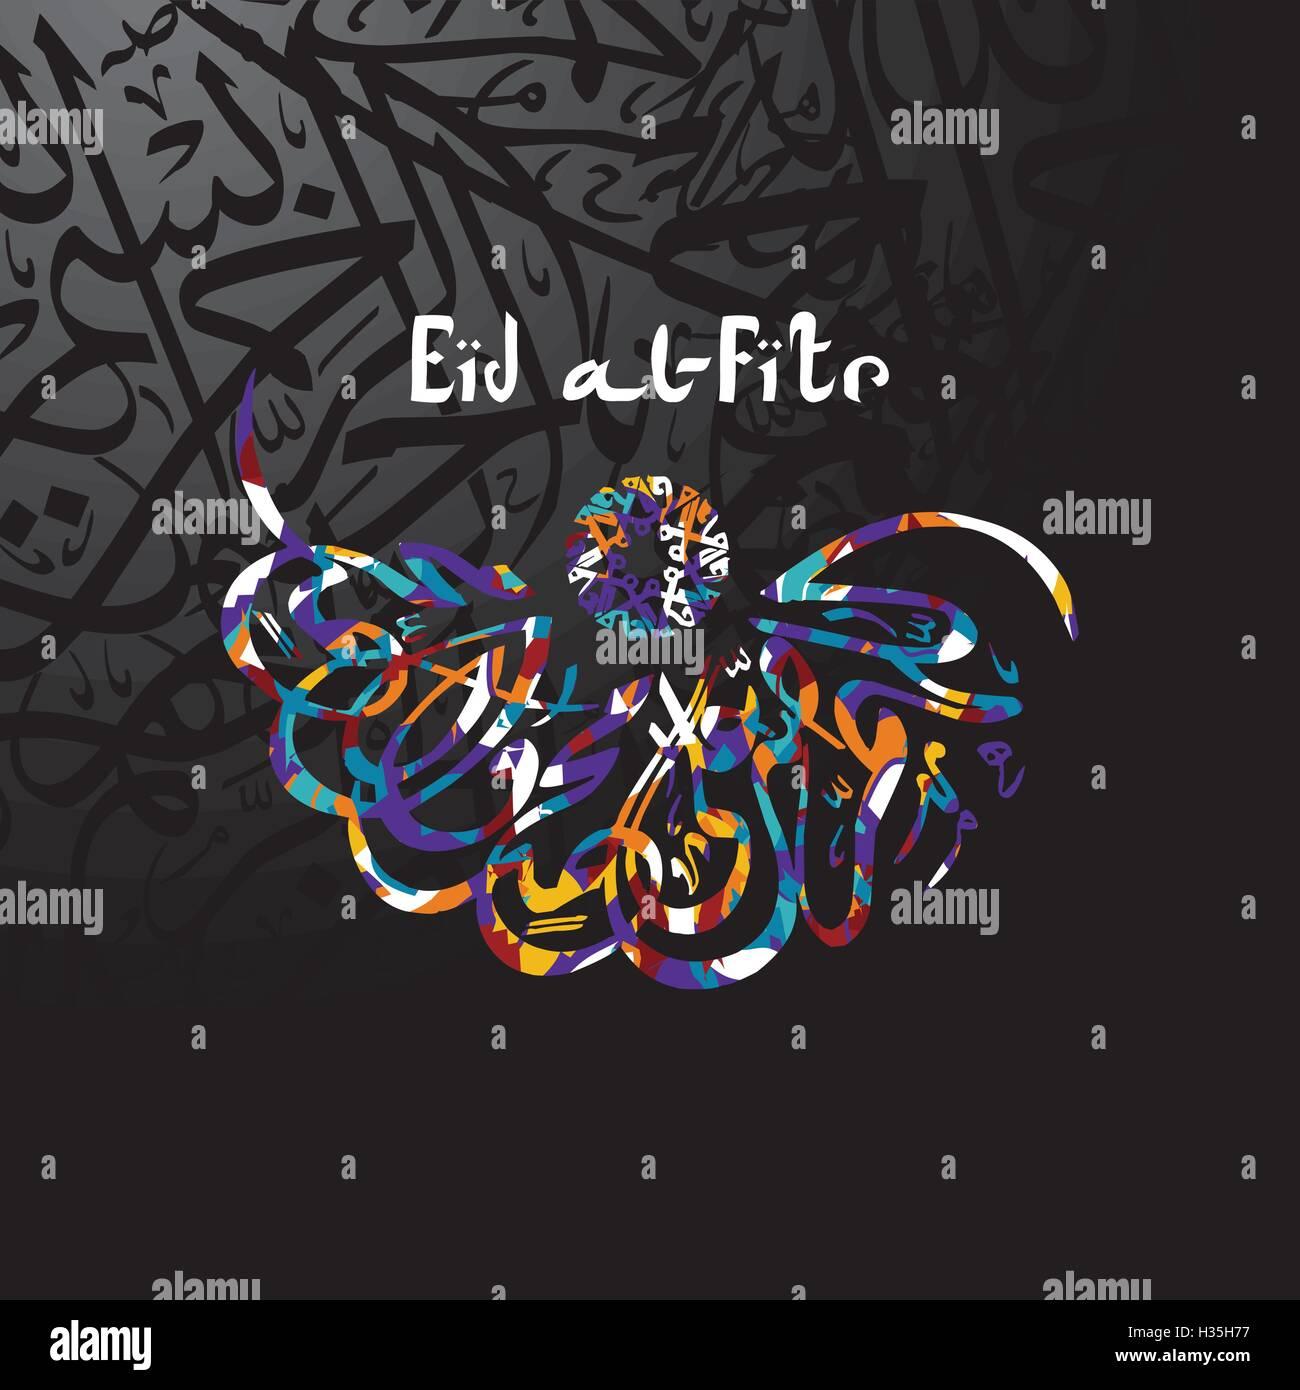 Happy eid mubarak greetings arabic calligraphy art stock vector art happy eid mubarak greetings arabic calligraphy art m4hsunfo